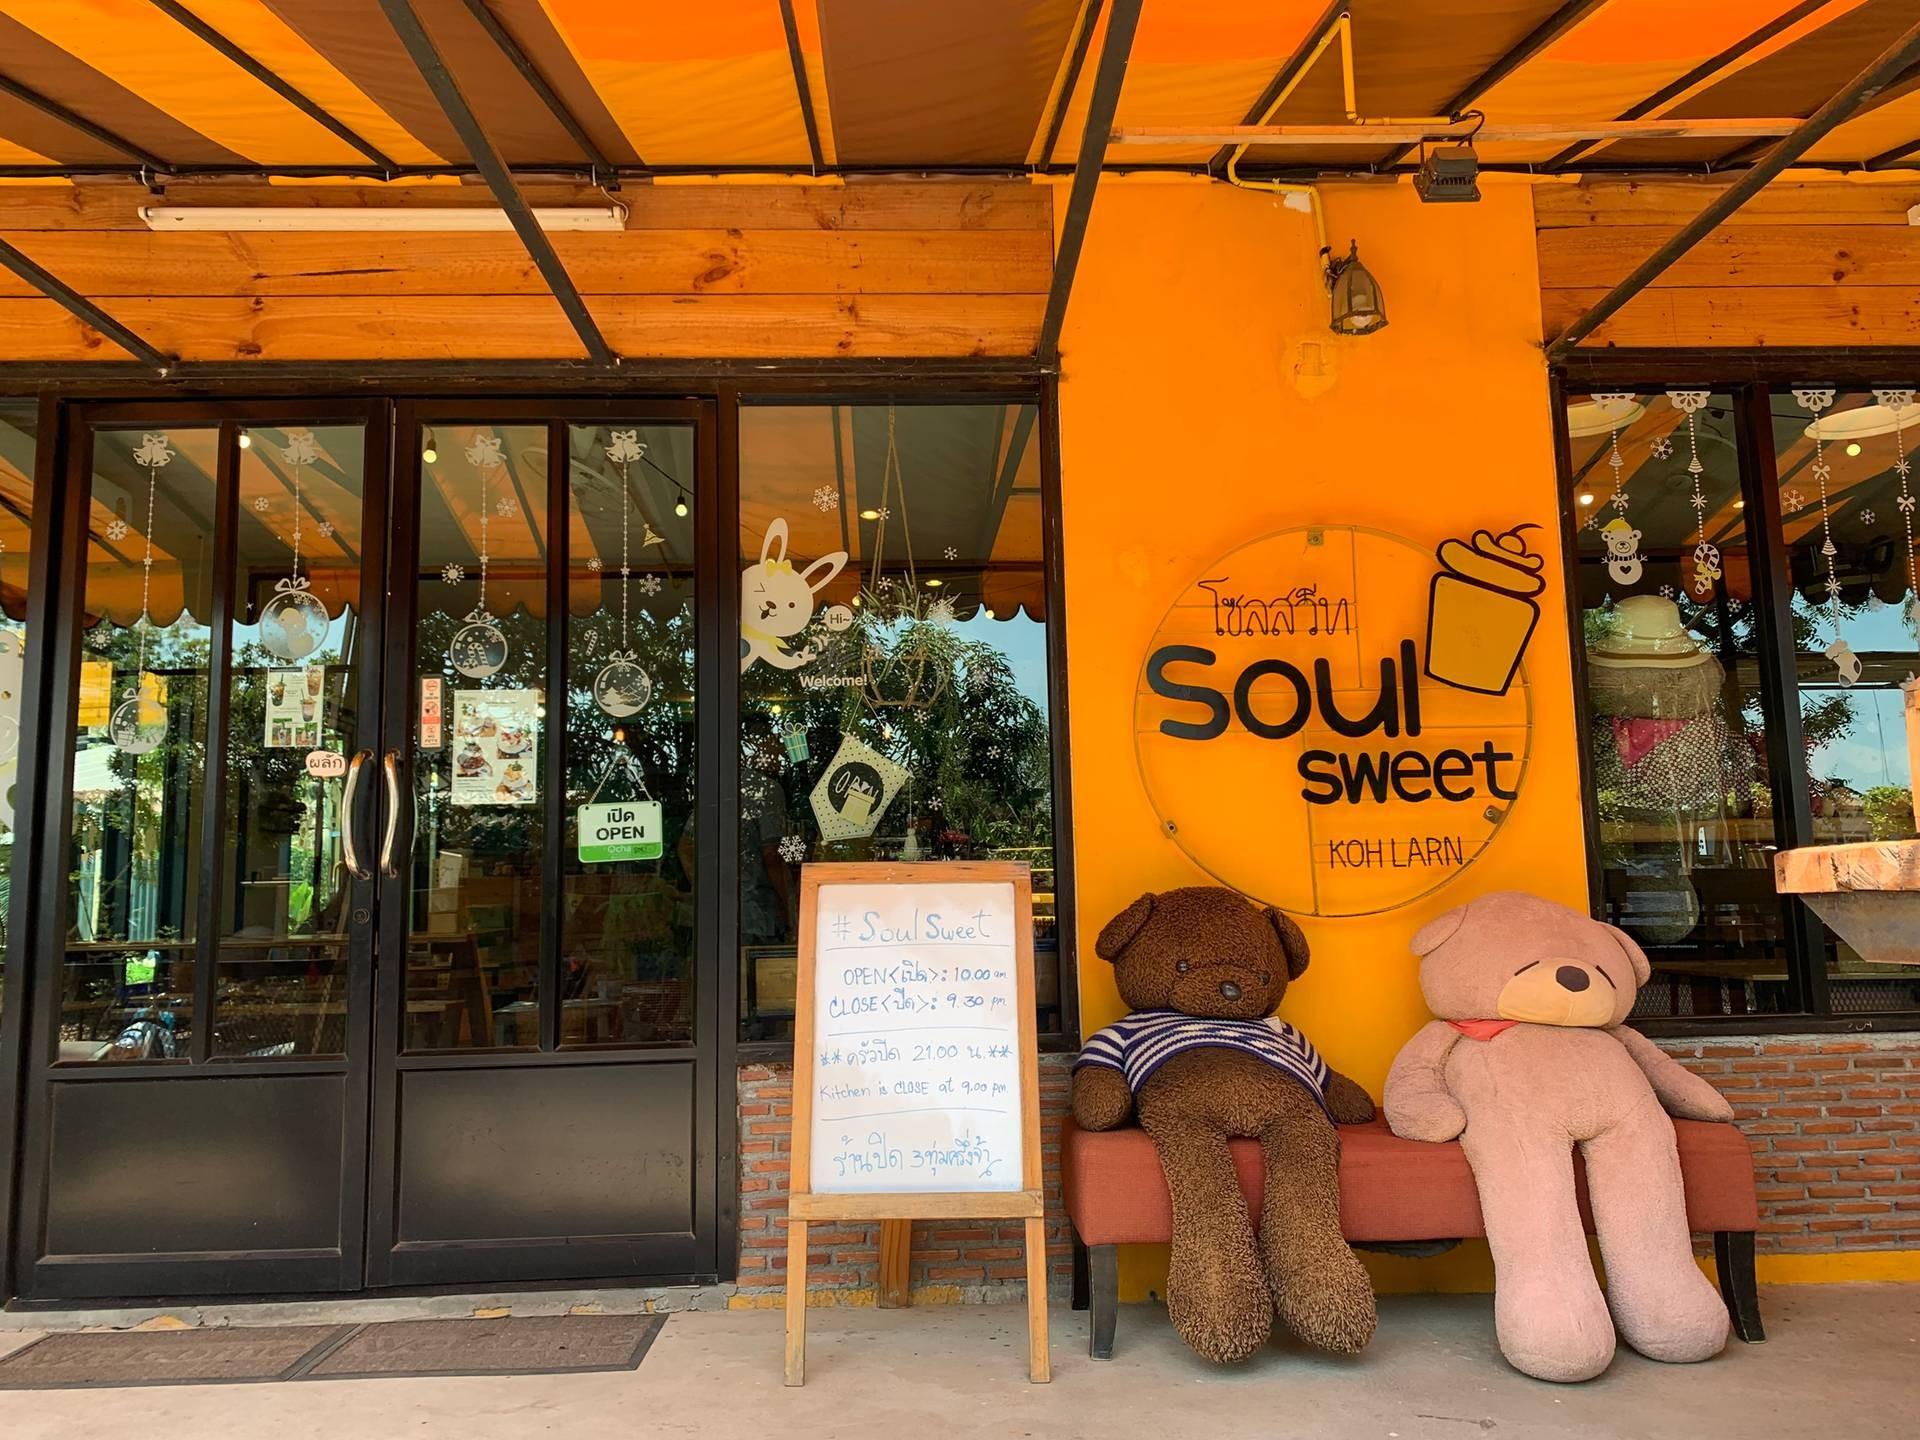 Soul sweet ' Koh Larn เกาะล้าน